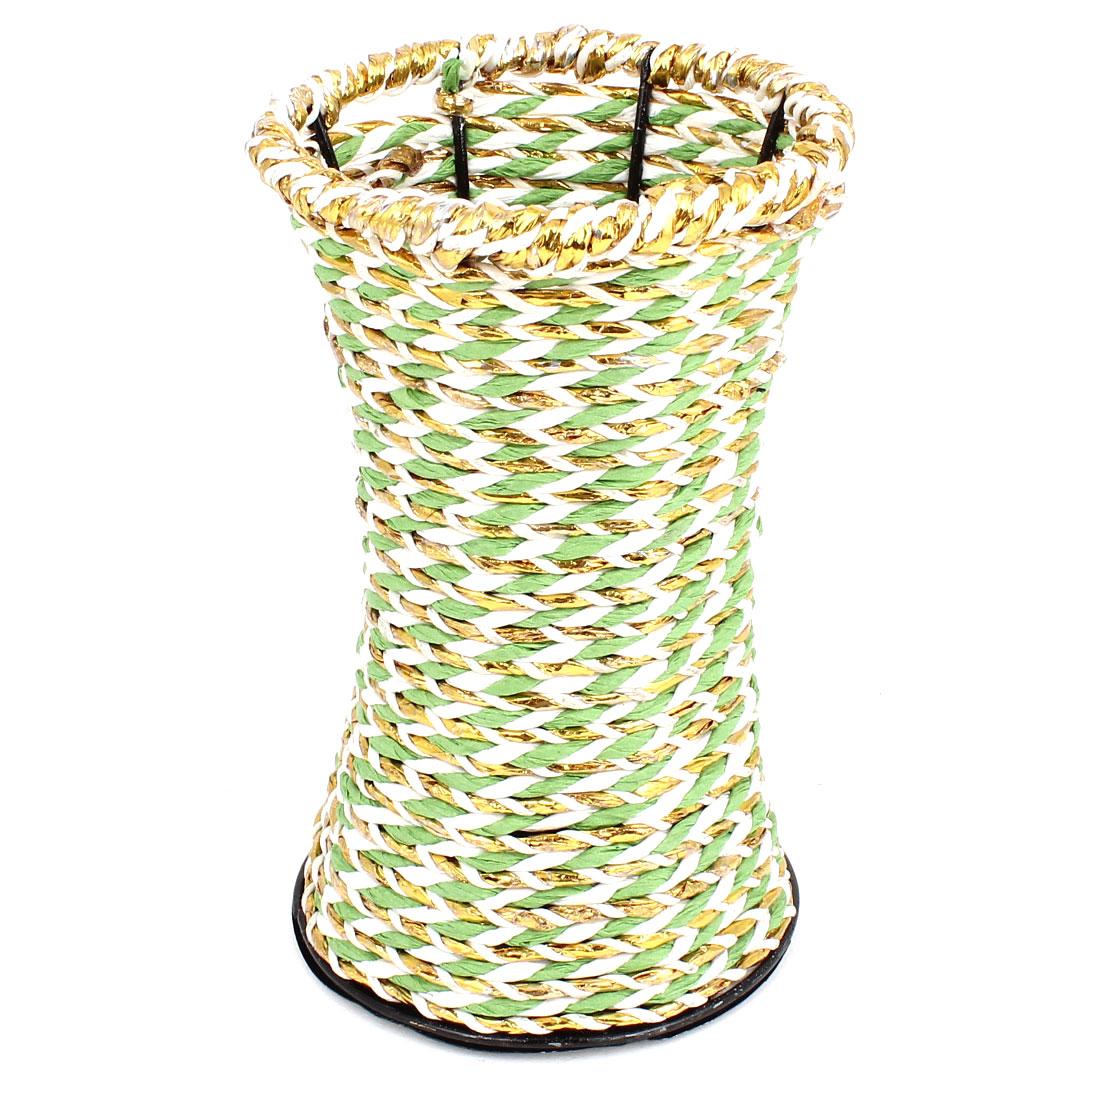 Metal Frame Gold Tone Green Weave Craft Manmade Flowers Vase Decor